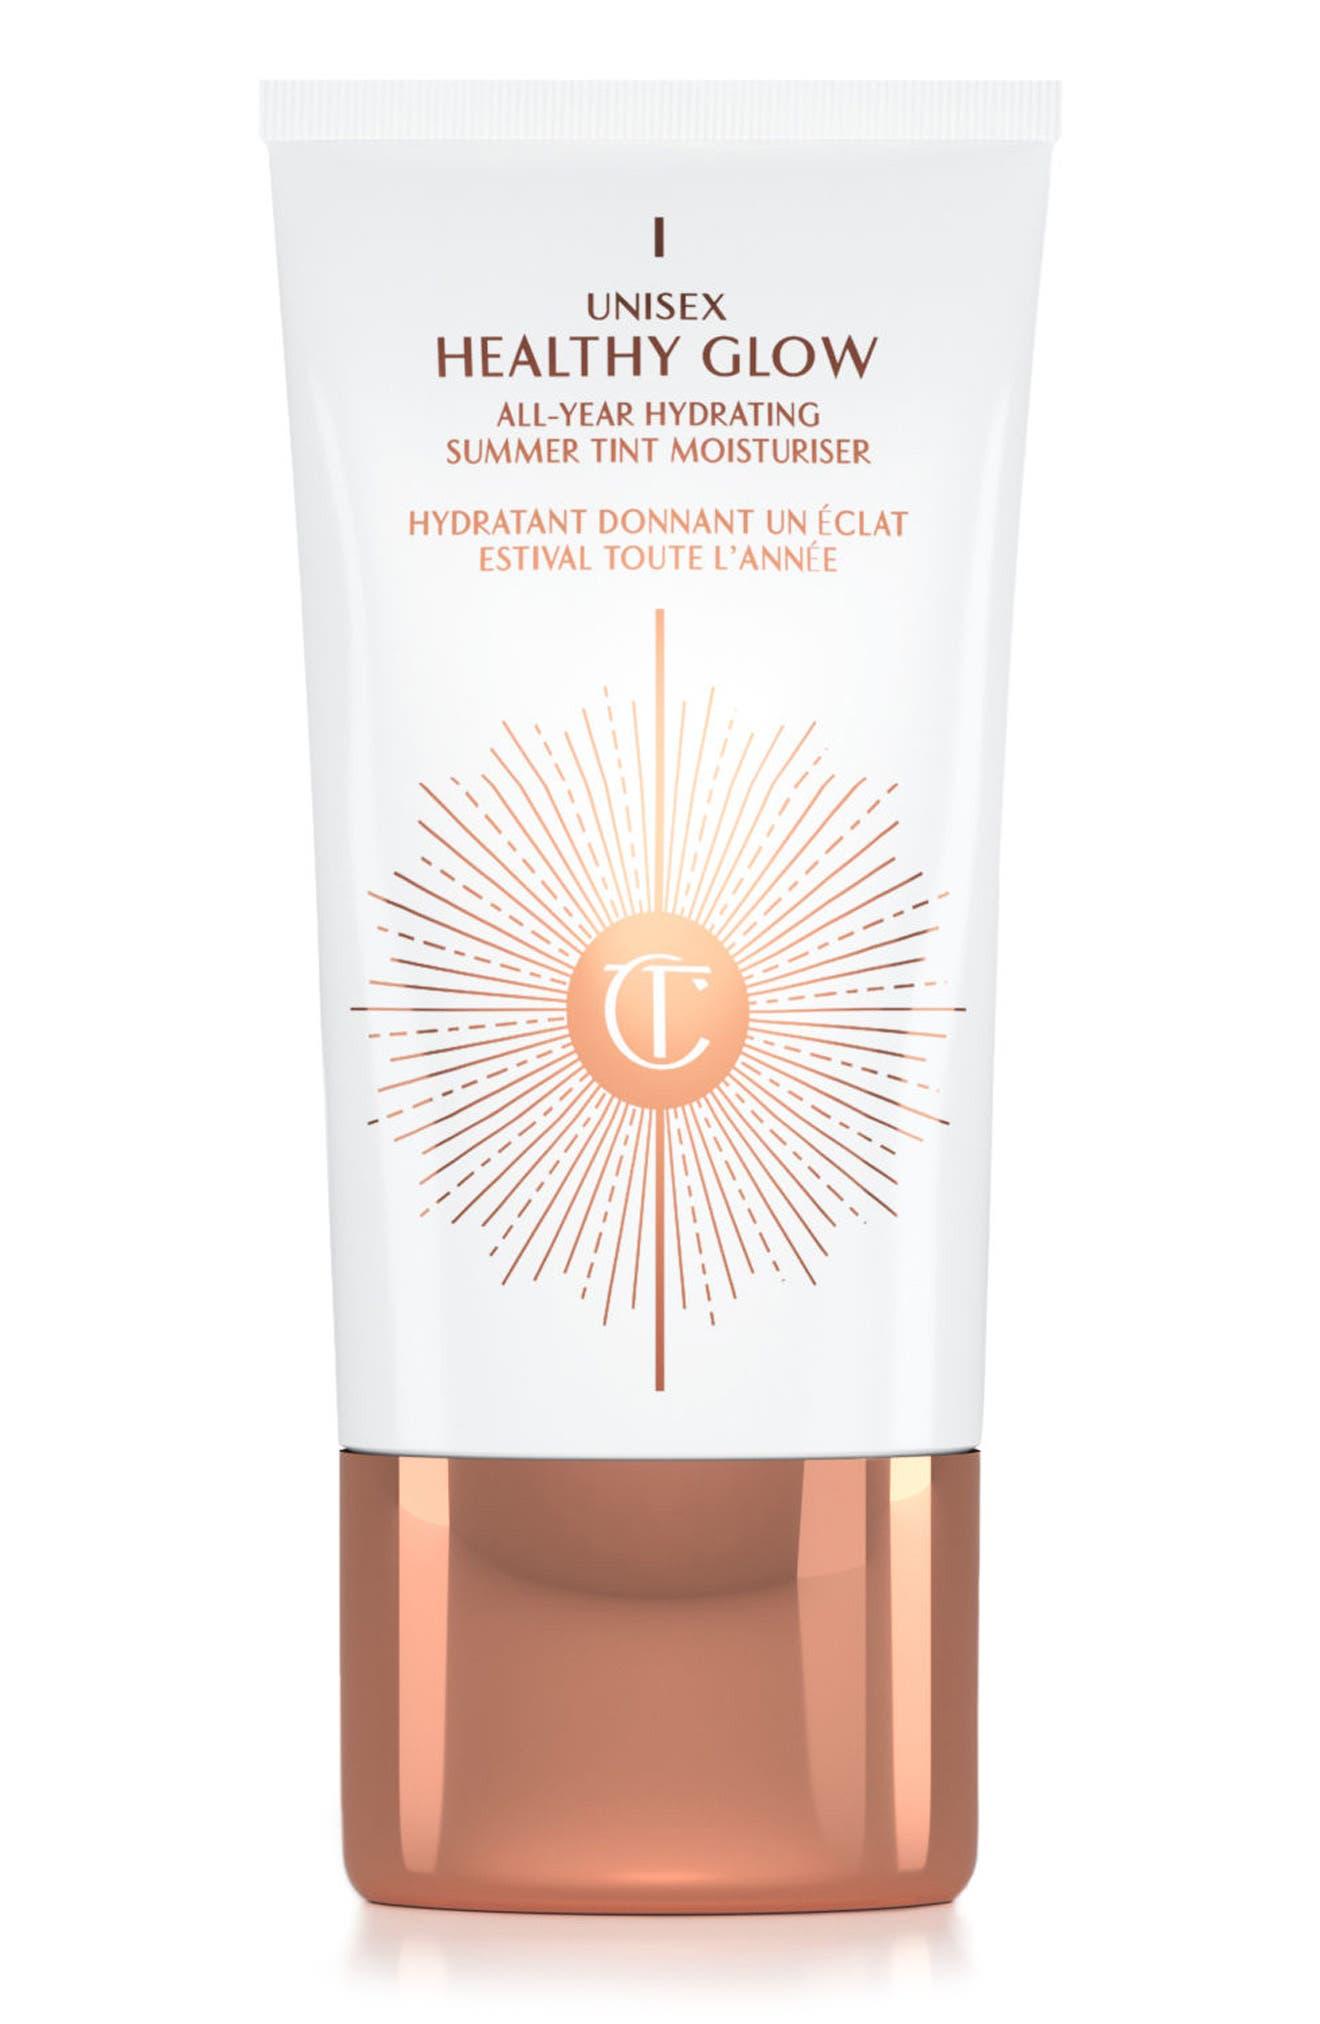 Charlotte Tilbury Unisex Healthy Glow